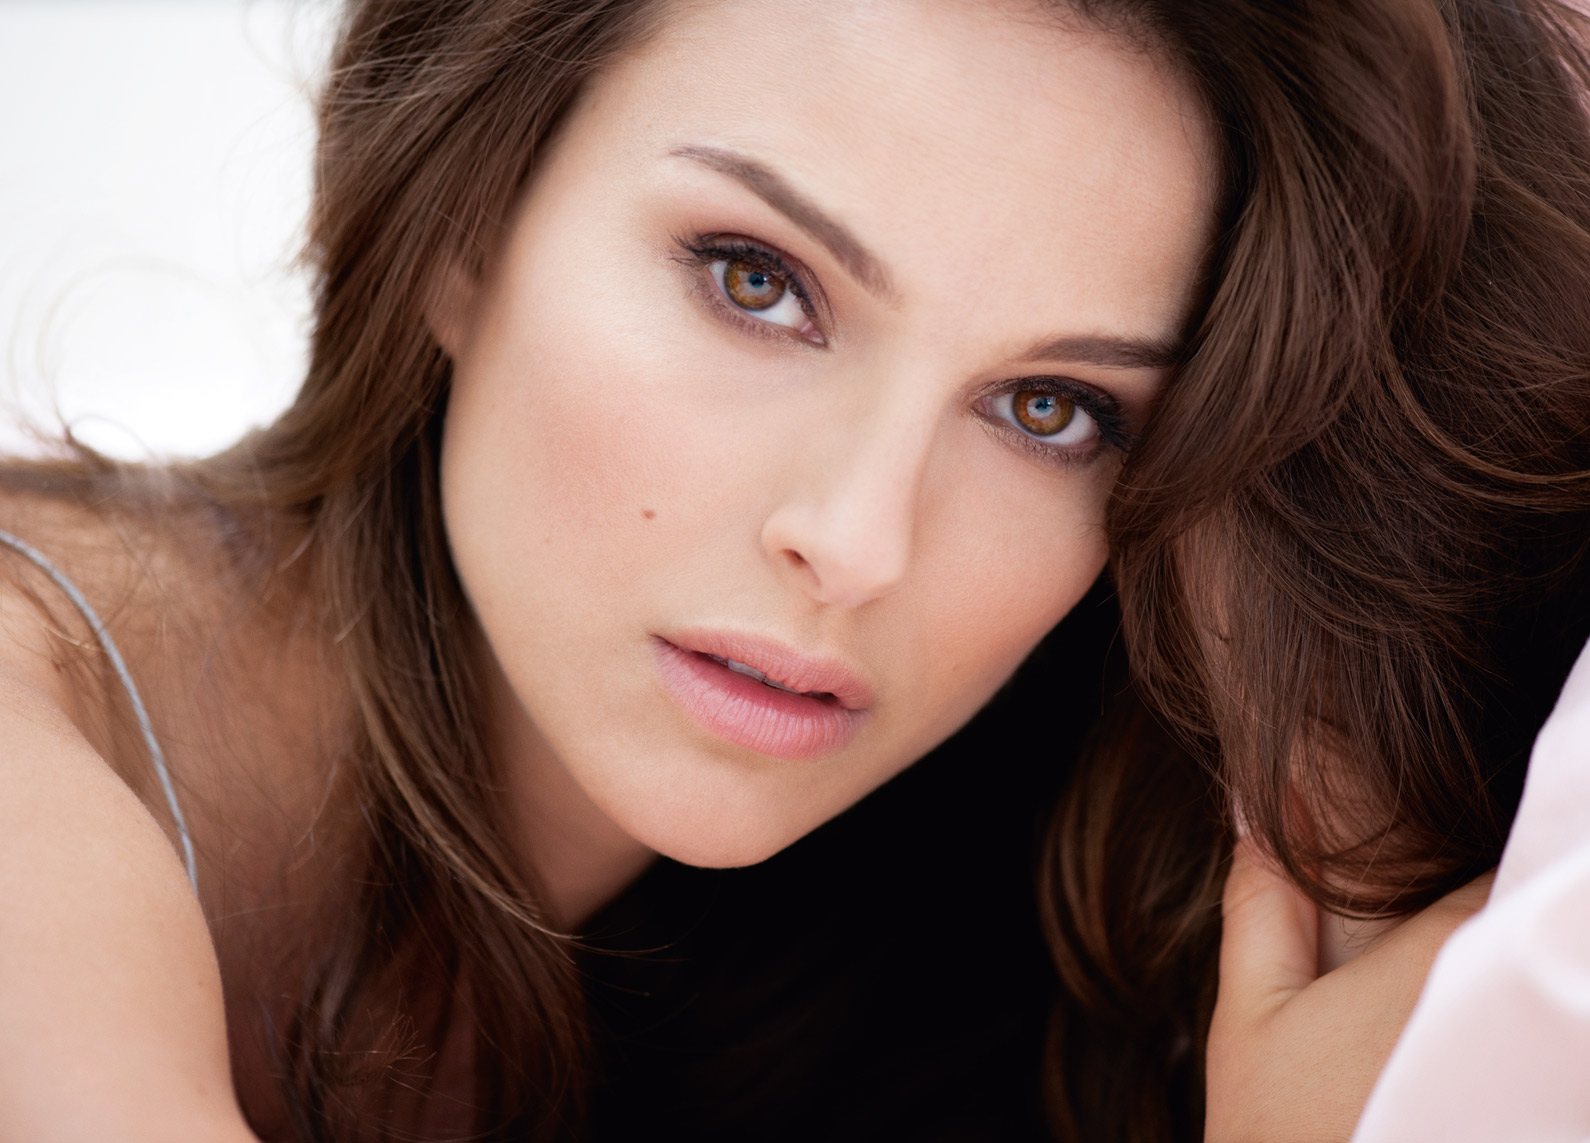 Natalie Portman HD Photo